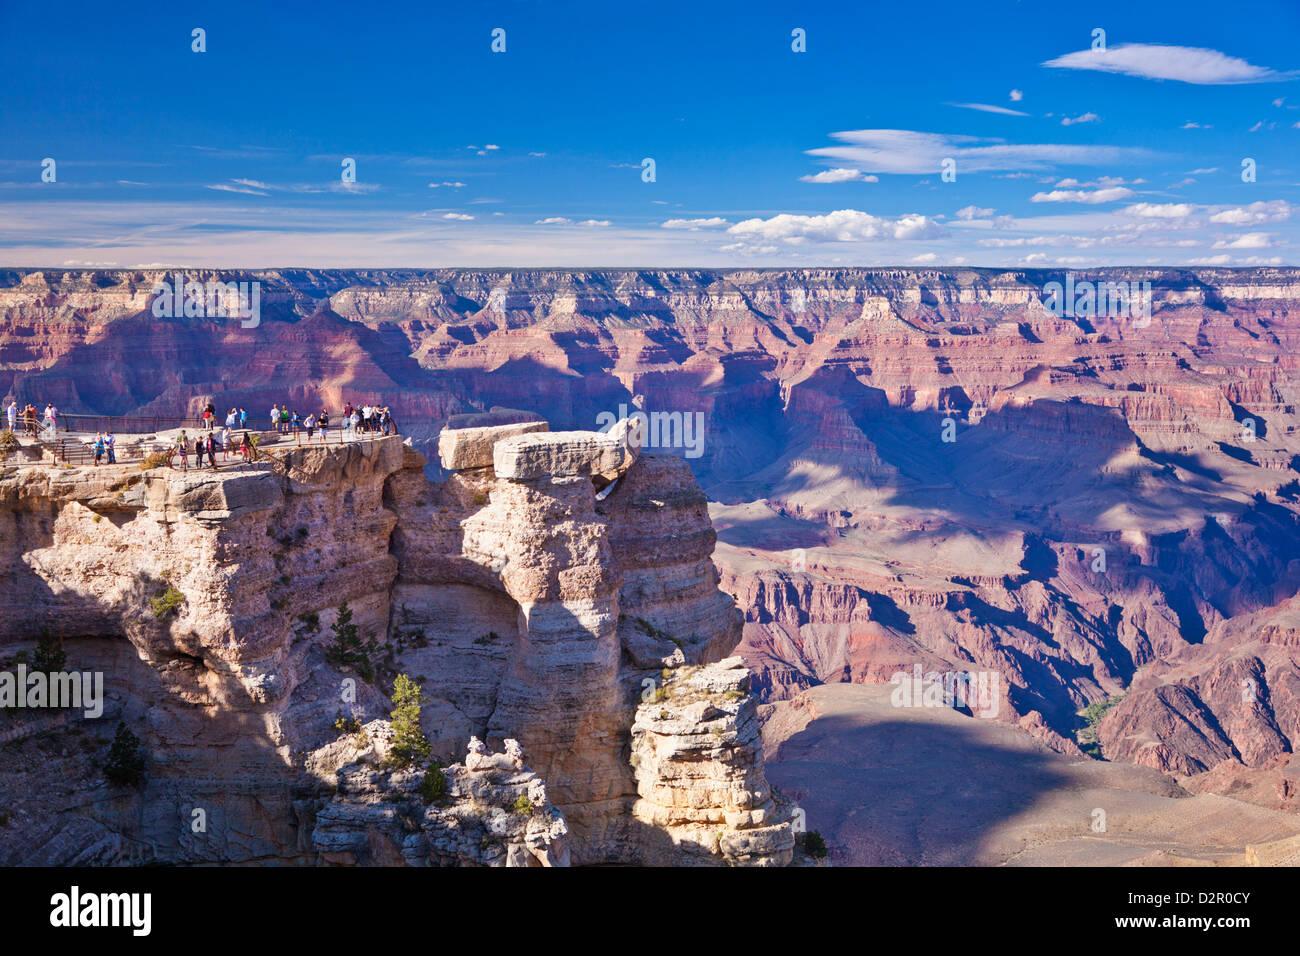 Touristen am Mather Point overlook, South Rim, Grand Canyon National Park, Arizona, USA Stockbild